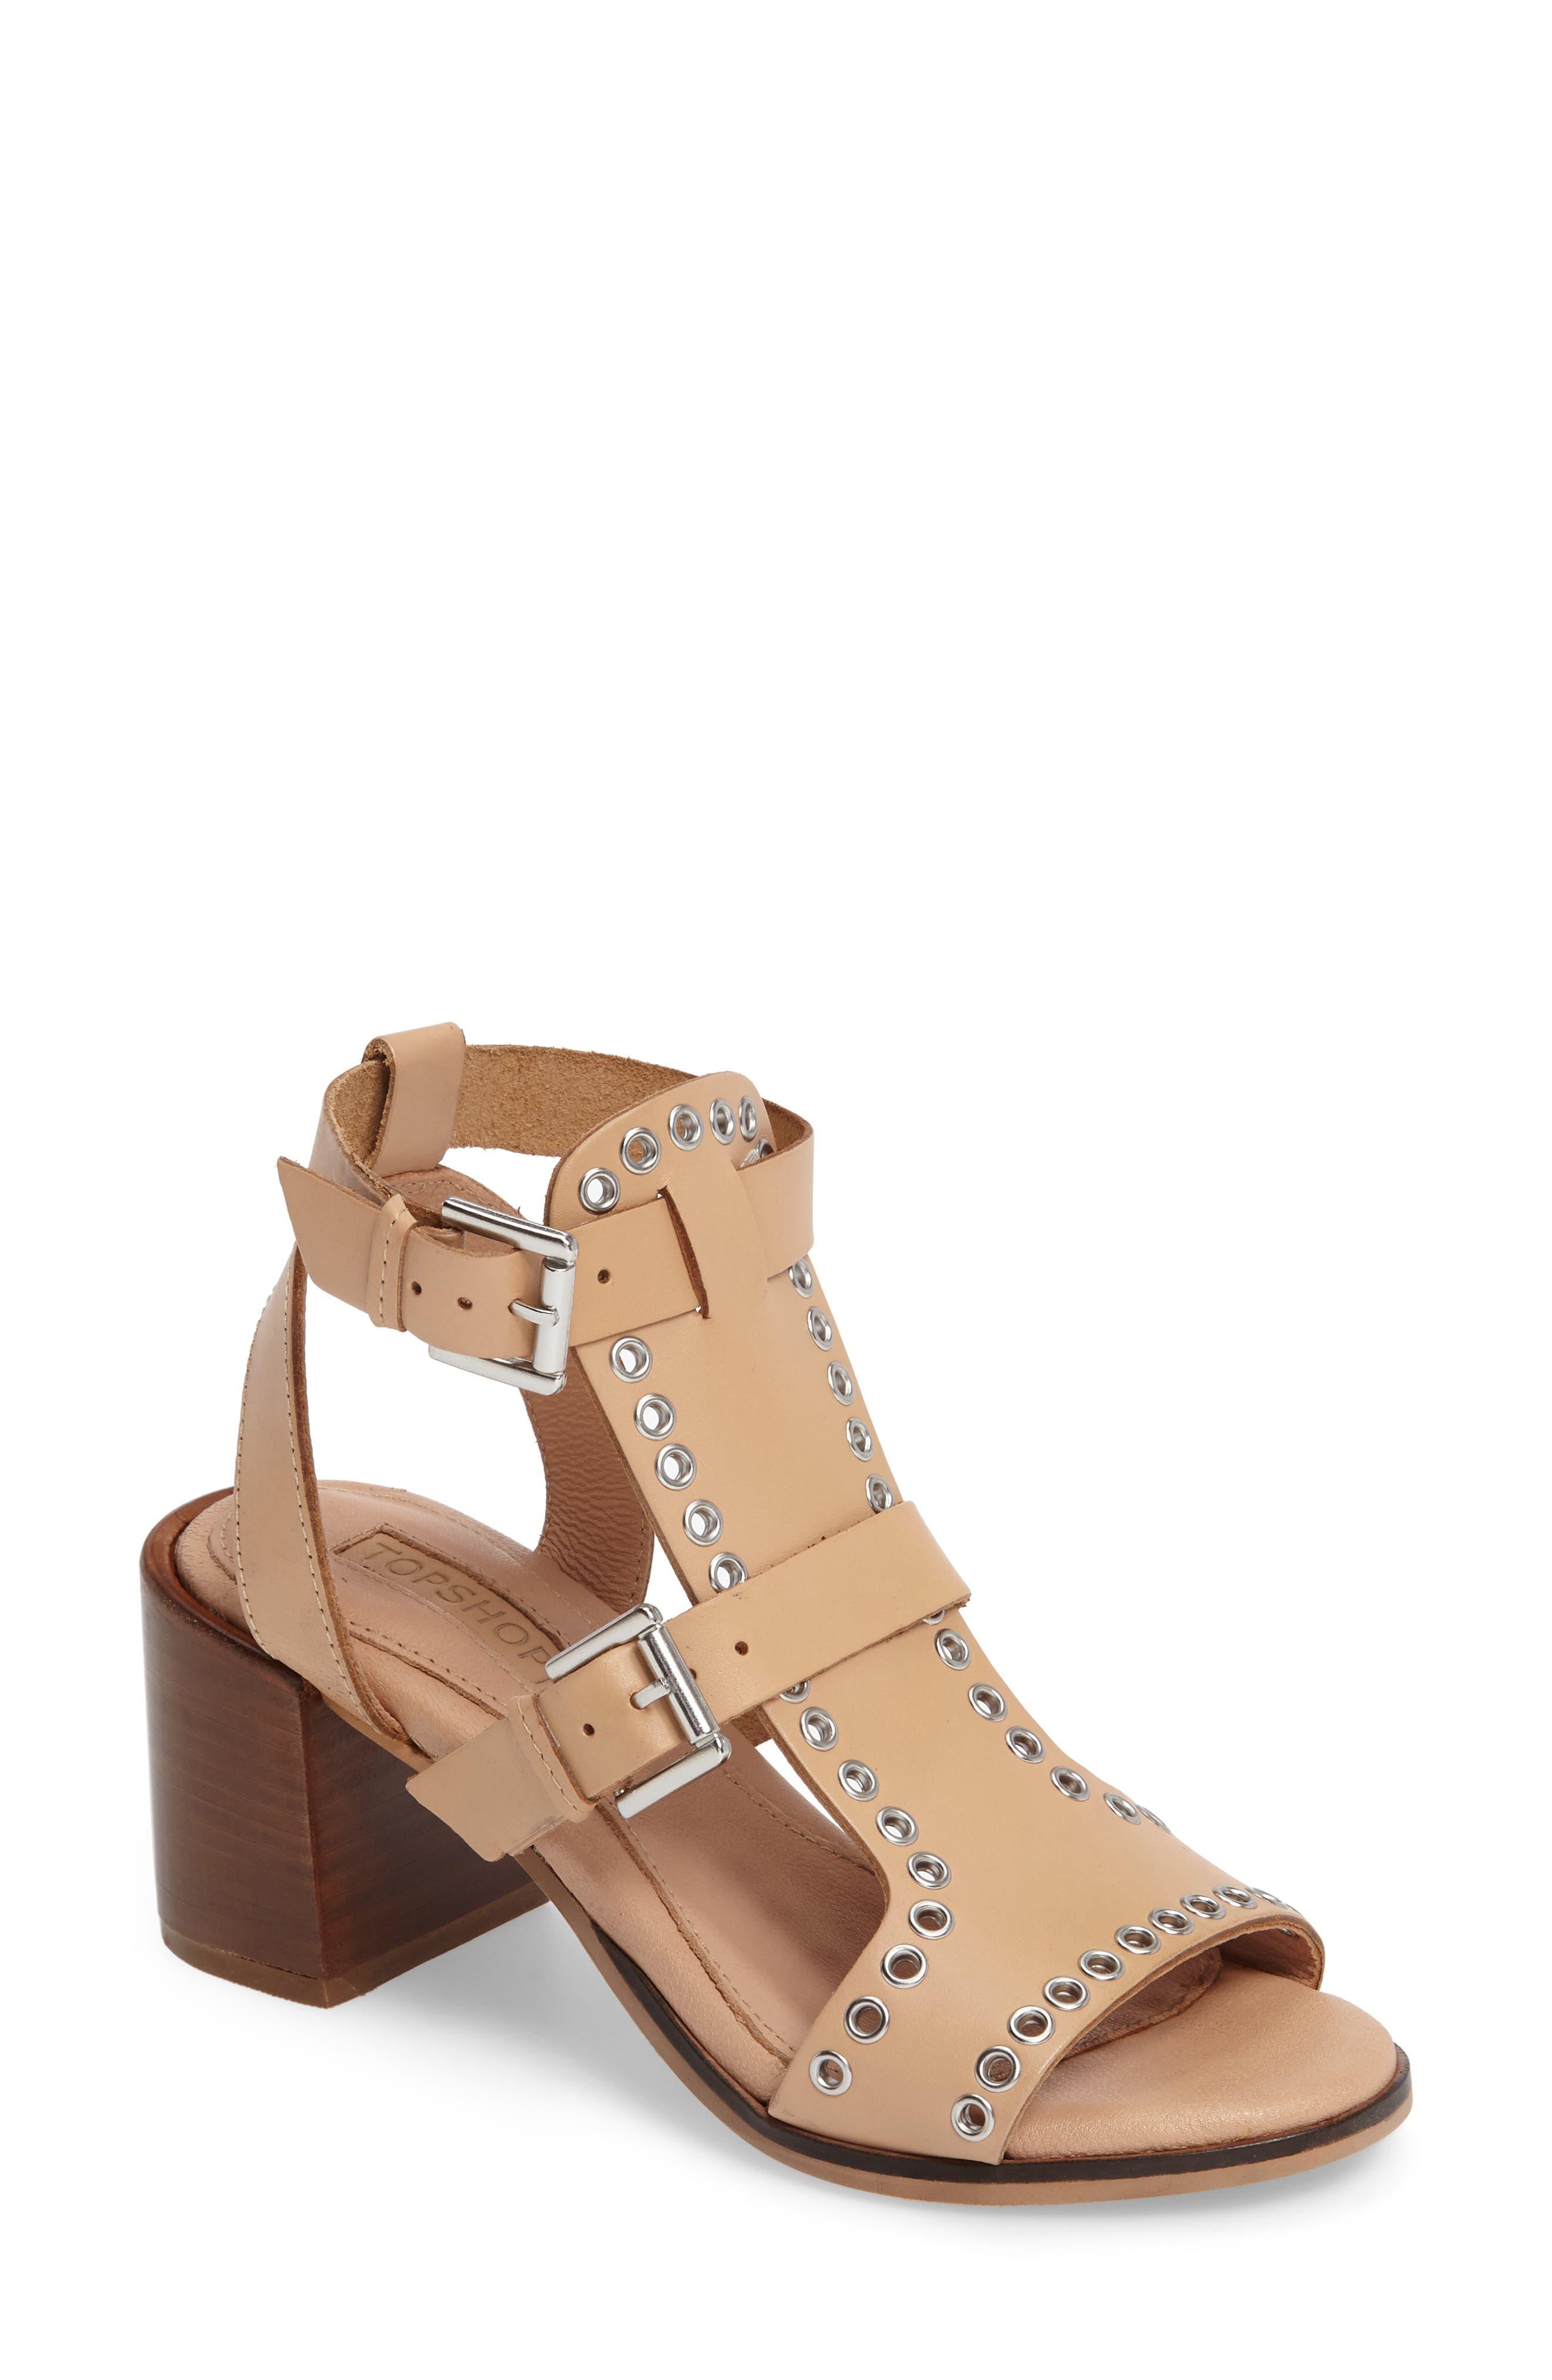 Main Image - Topshop Vienna Grommet Sandal (Women)